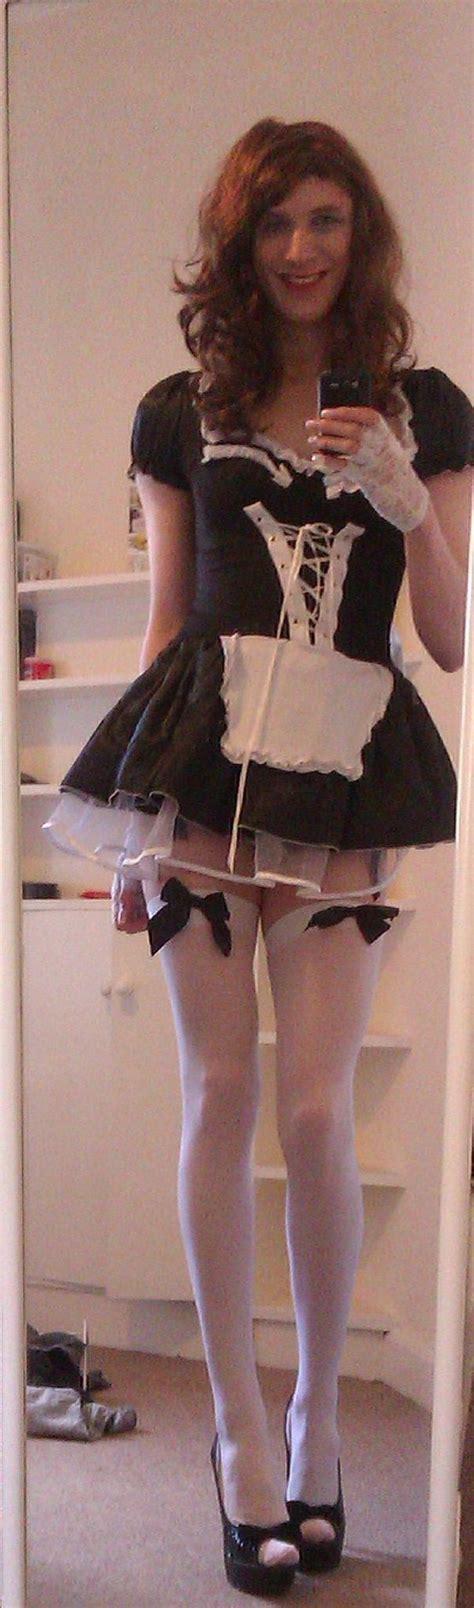 french maid boy french maid by mezuki111 on deviantart